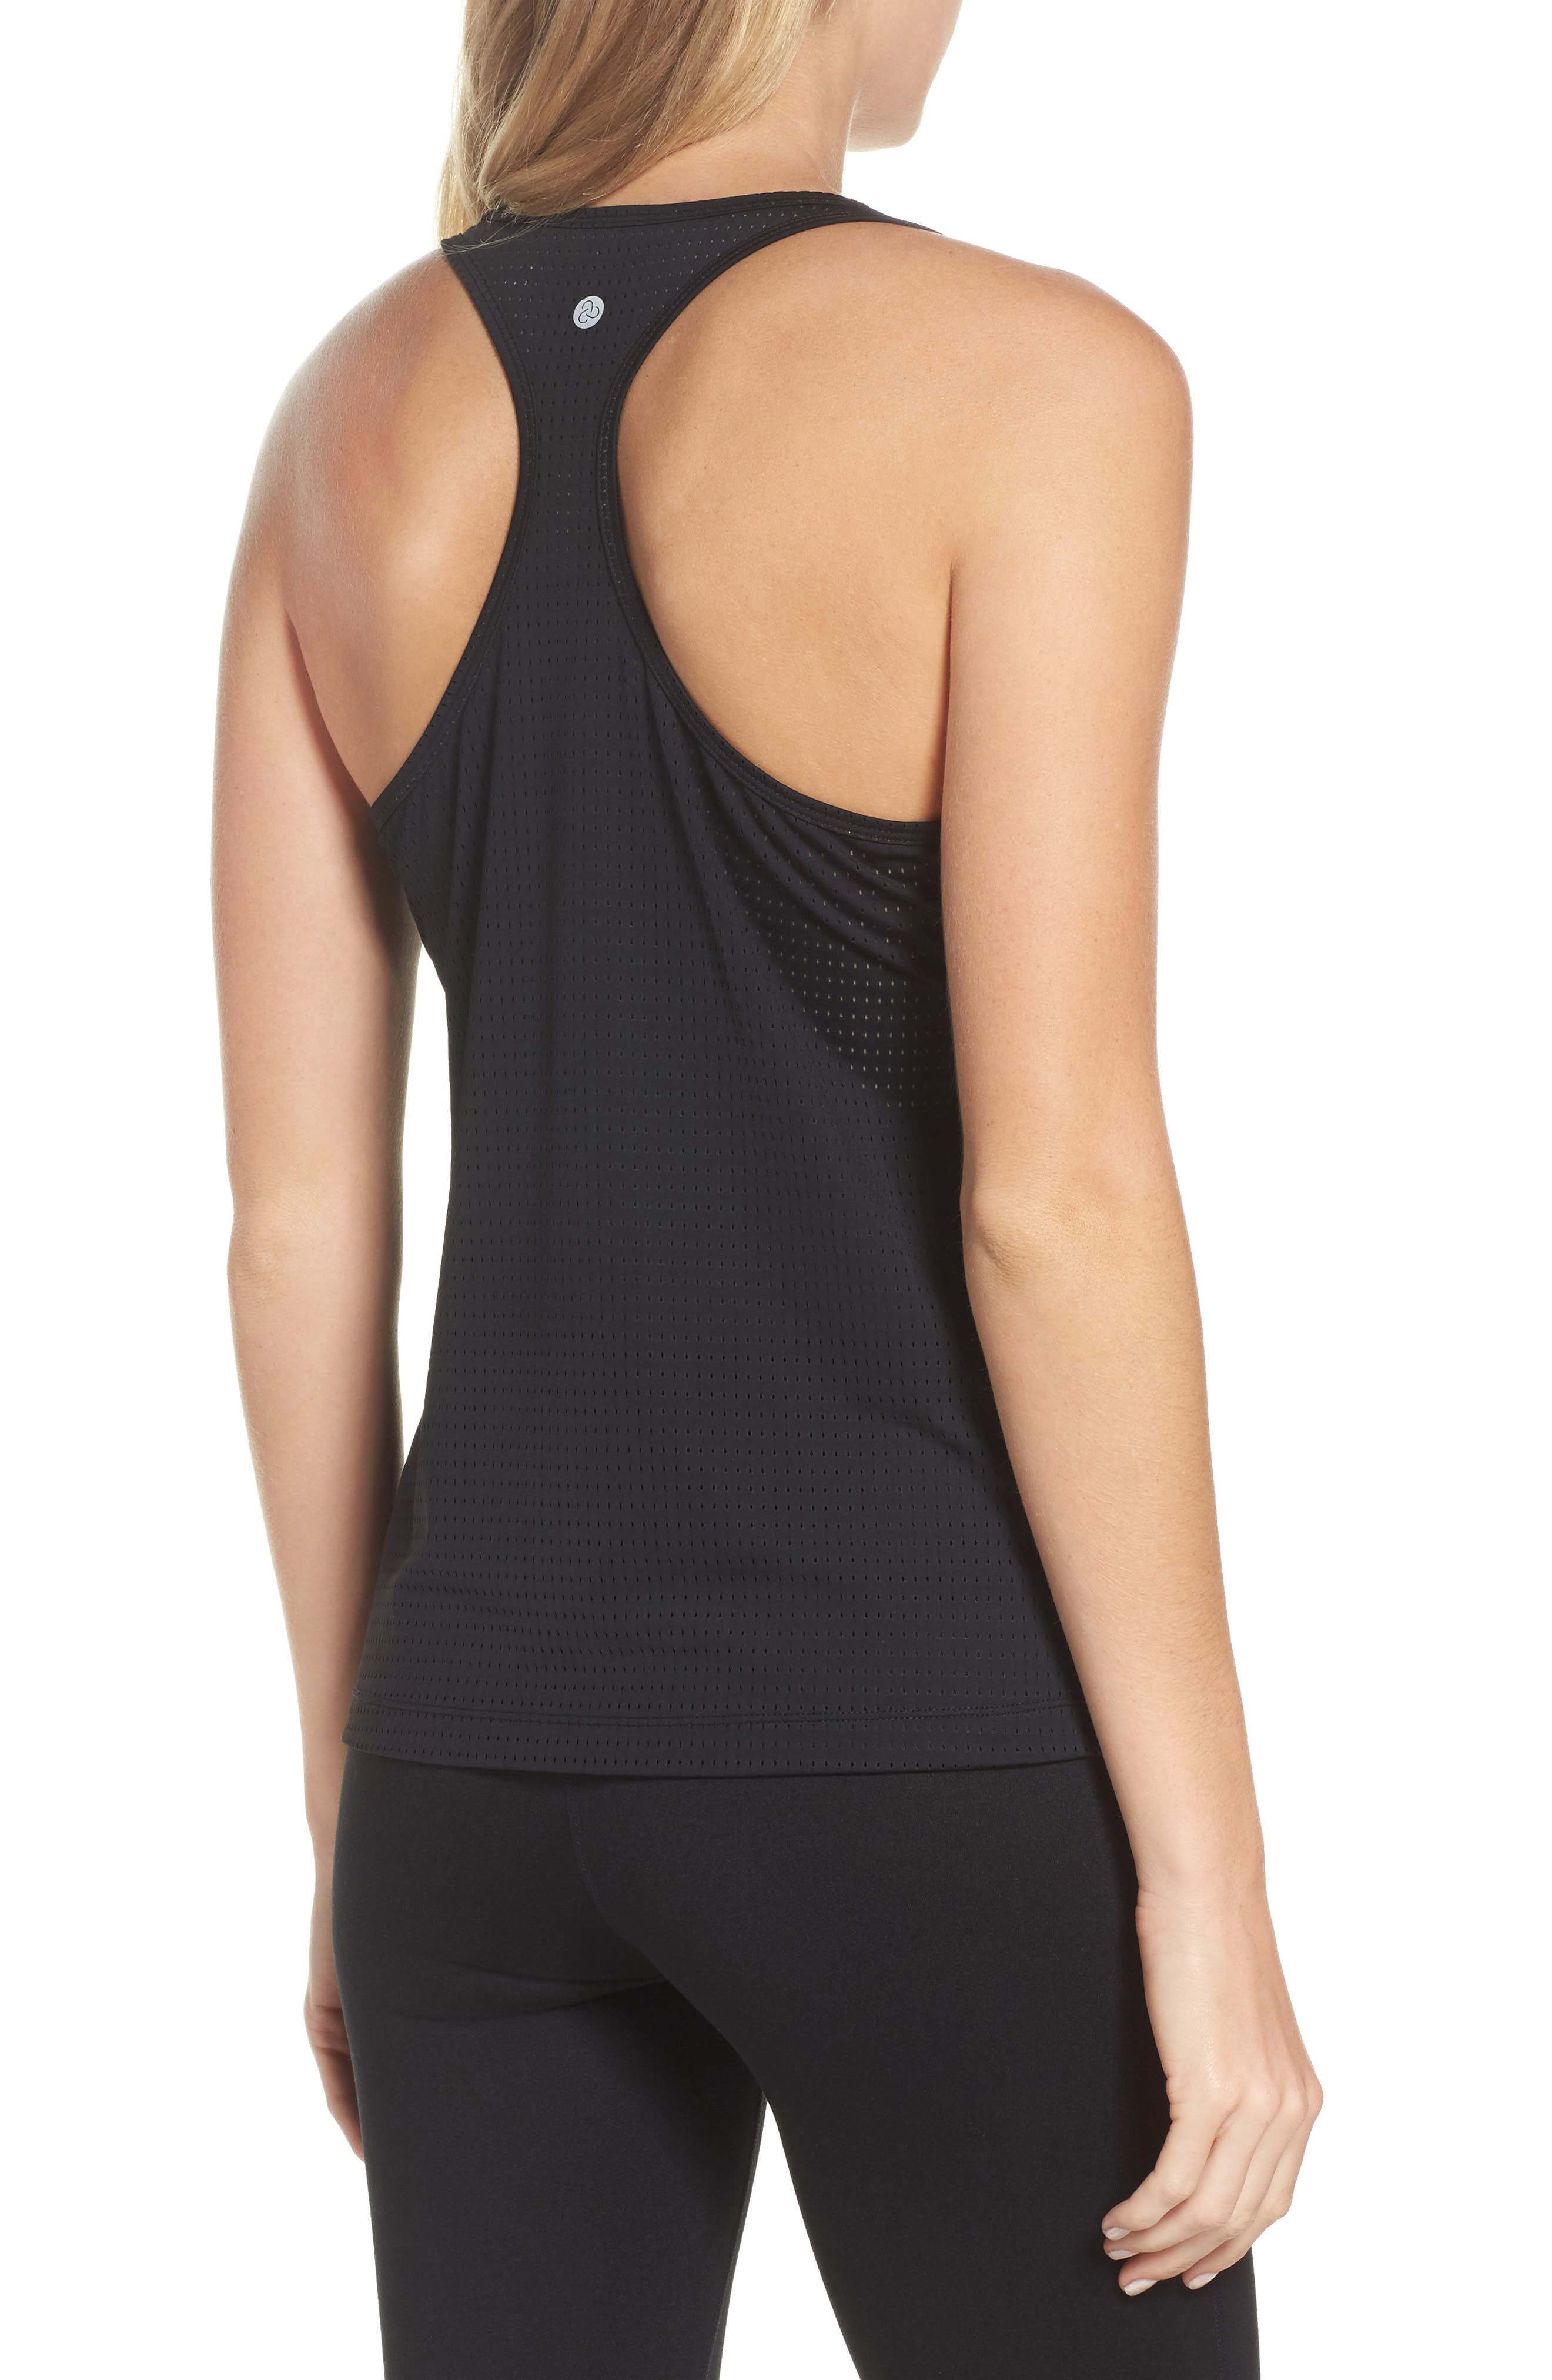 4a6d52b15592c Tops Zella Activewear for Women